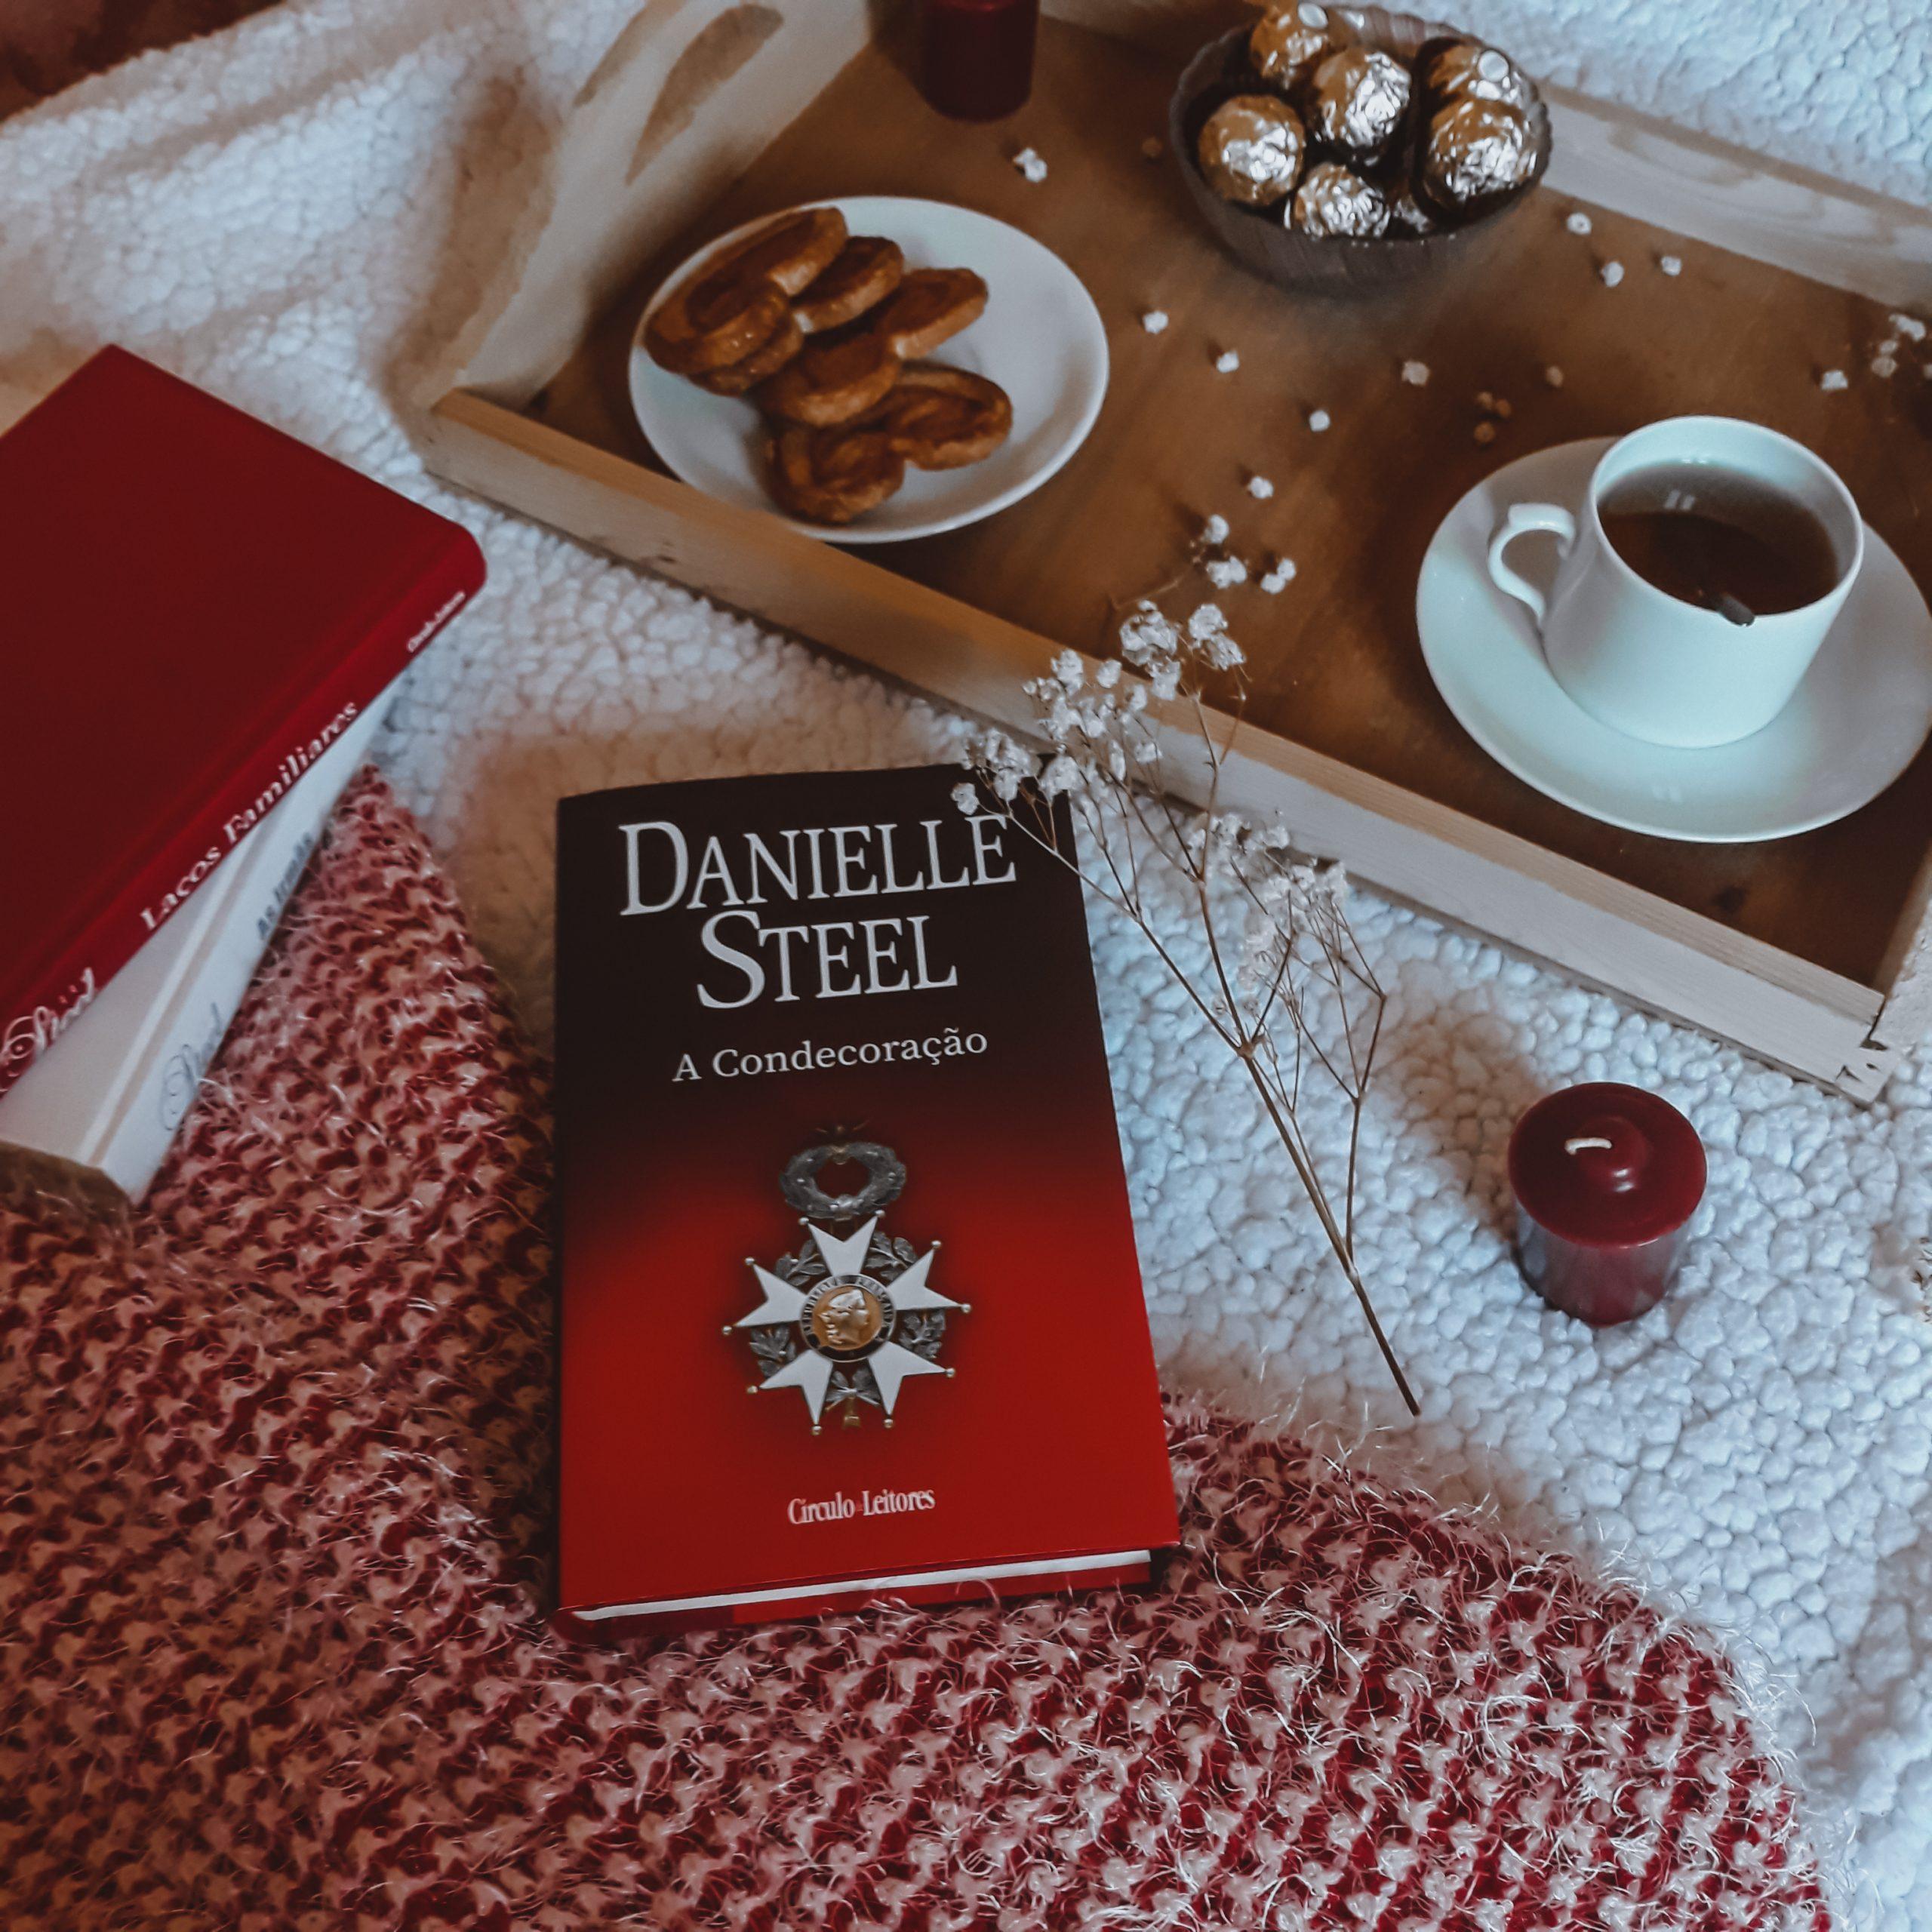 A Condecoração da Danielle Steel